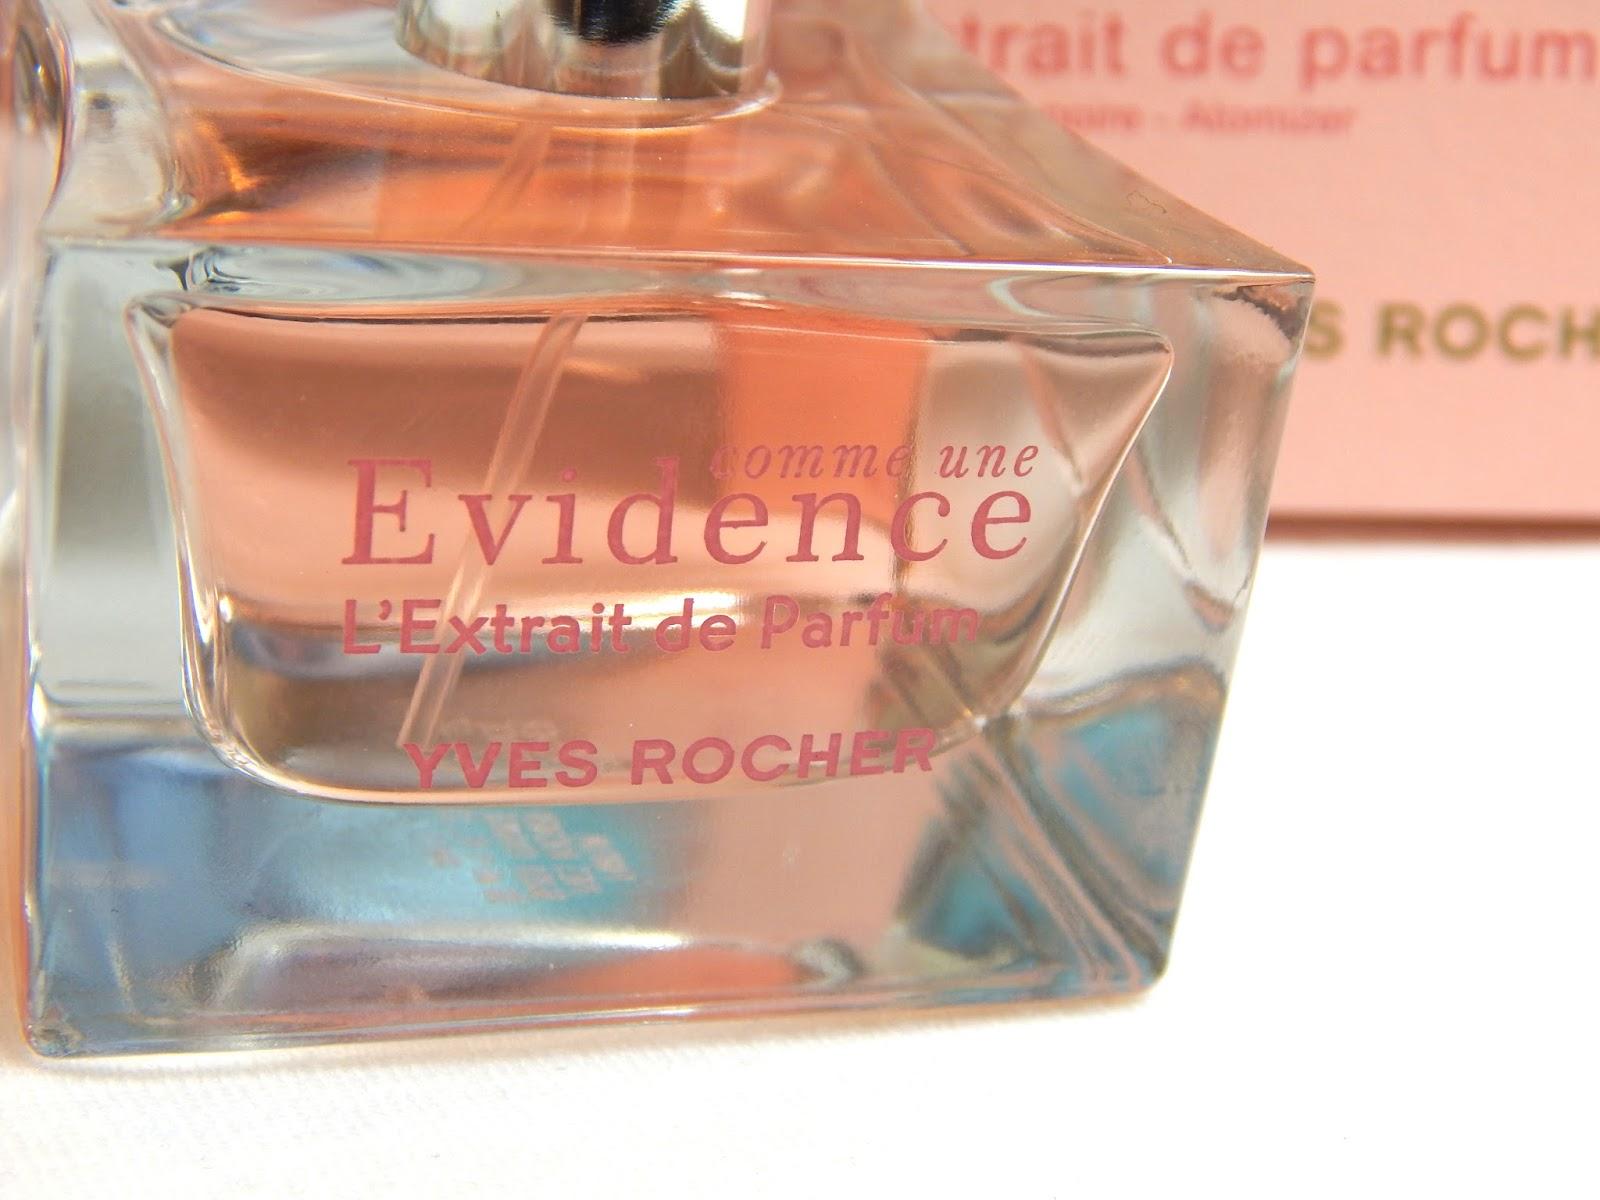 yves rocher evidence perfume